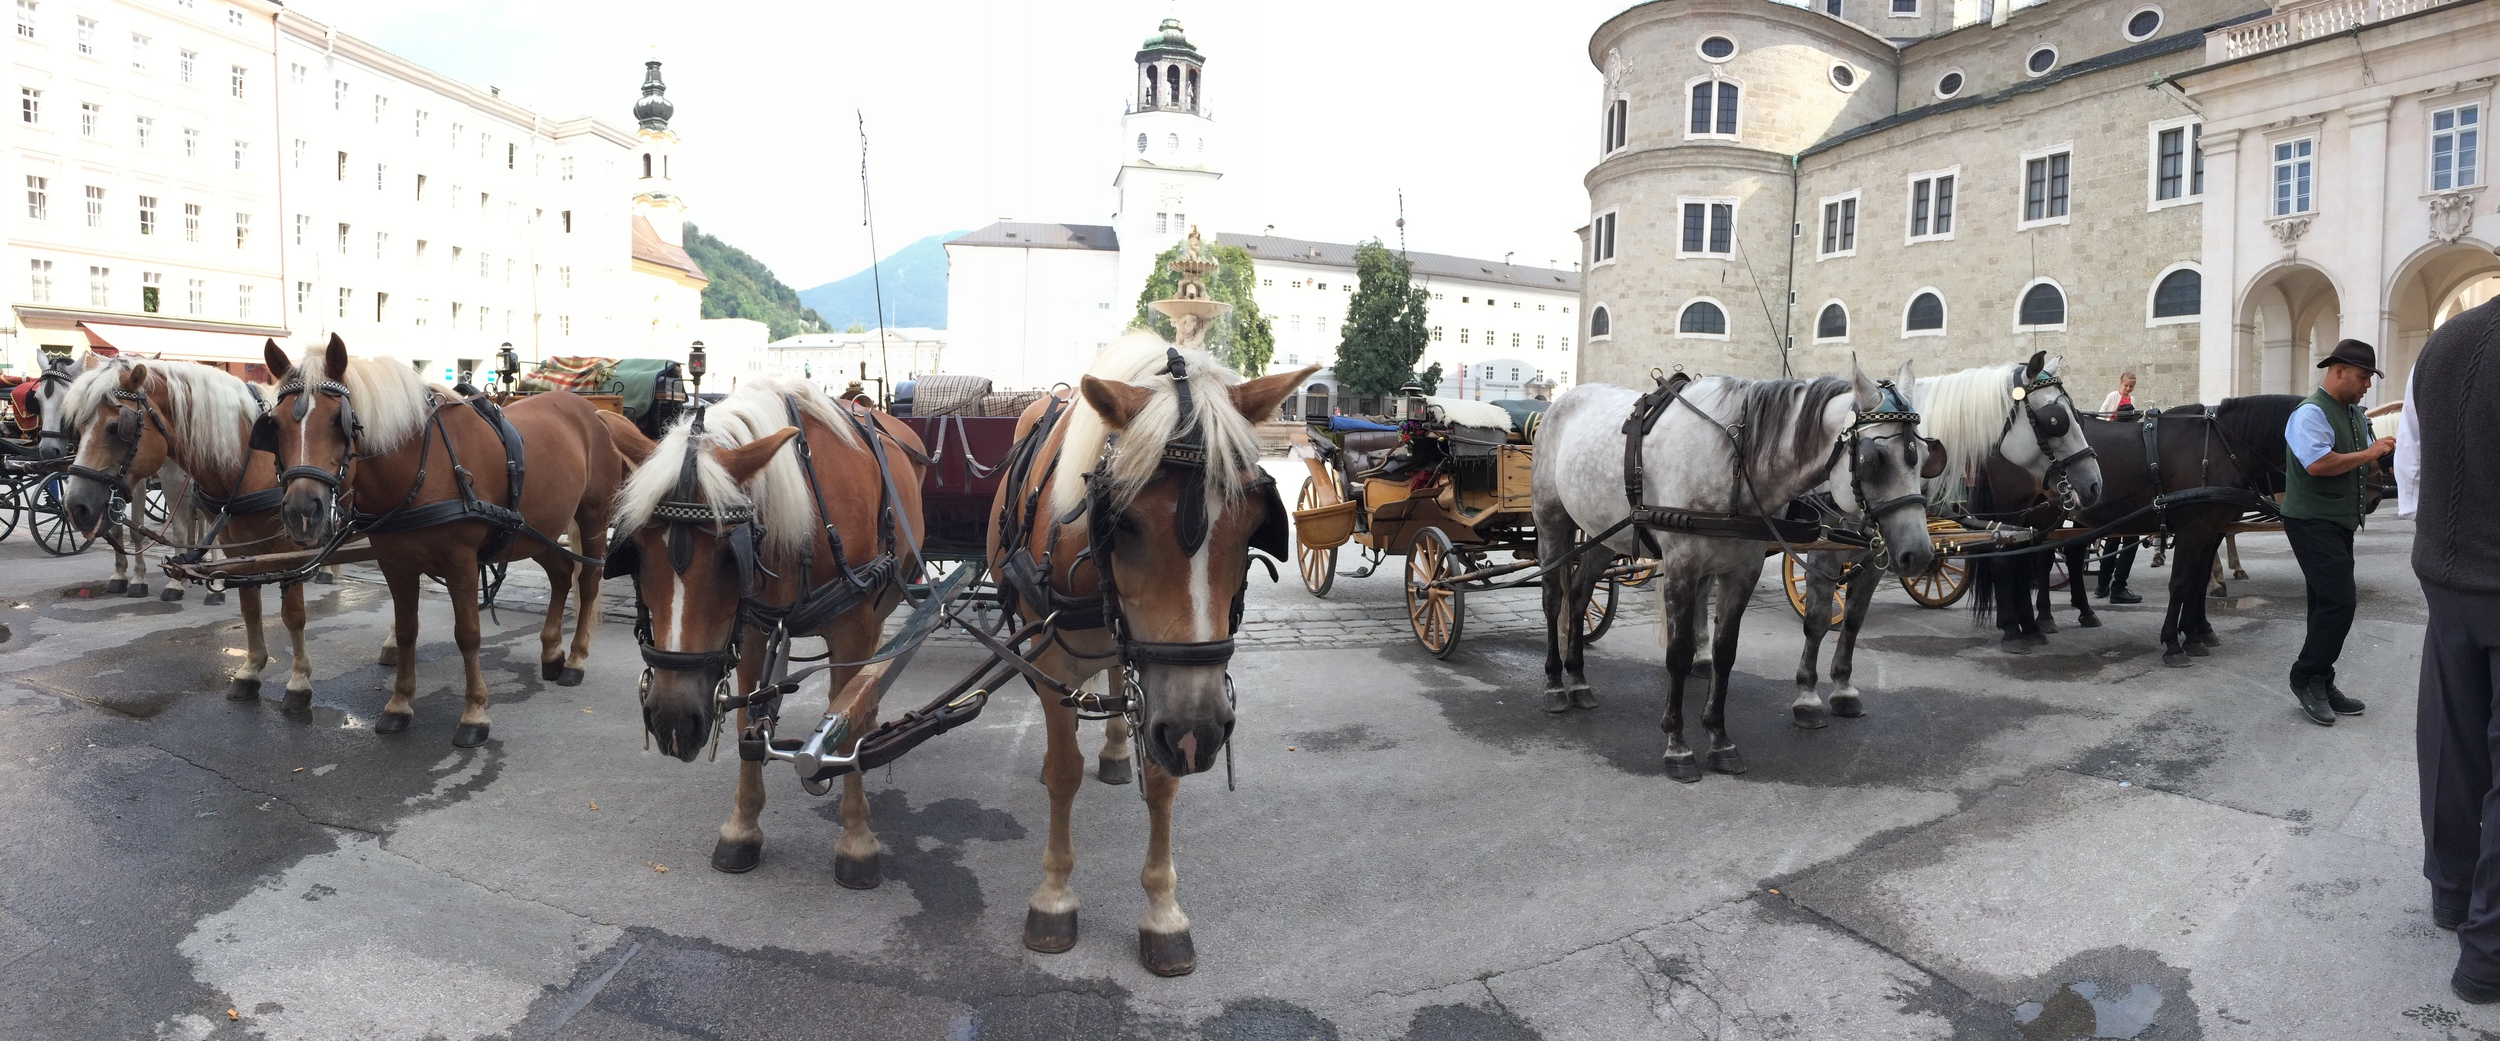 Altstadt -Salzburg, Austria